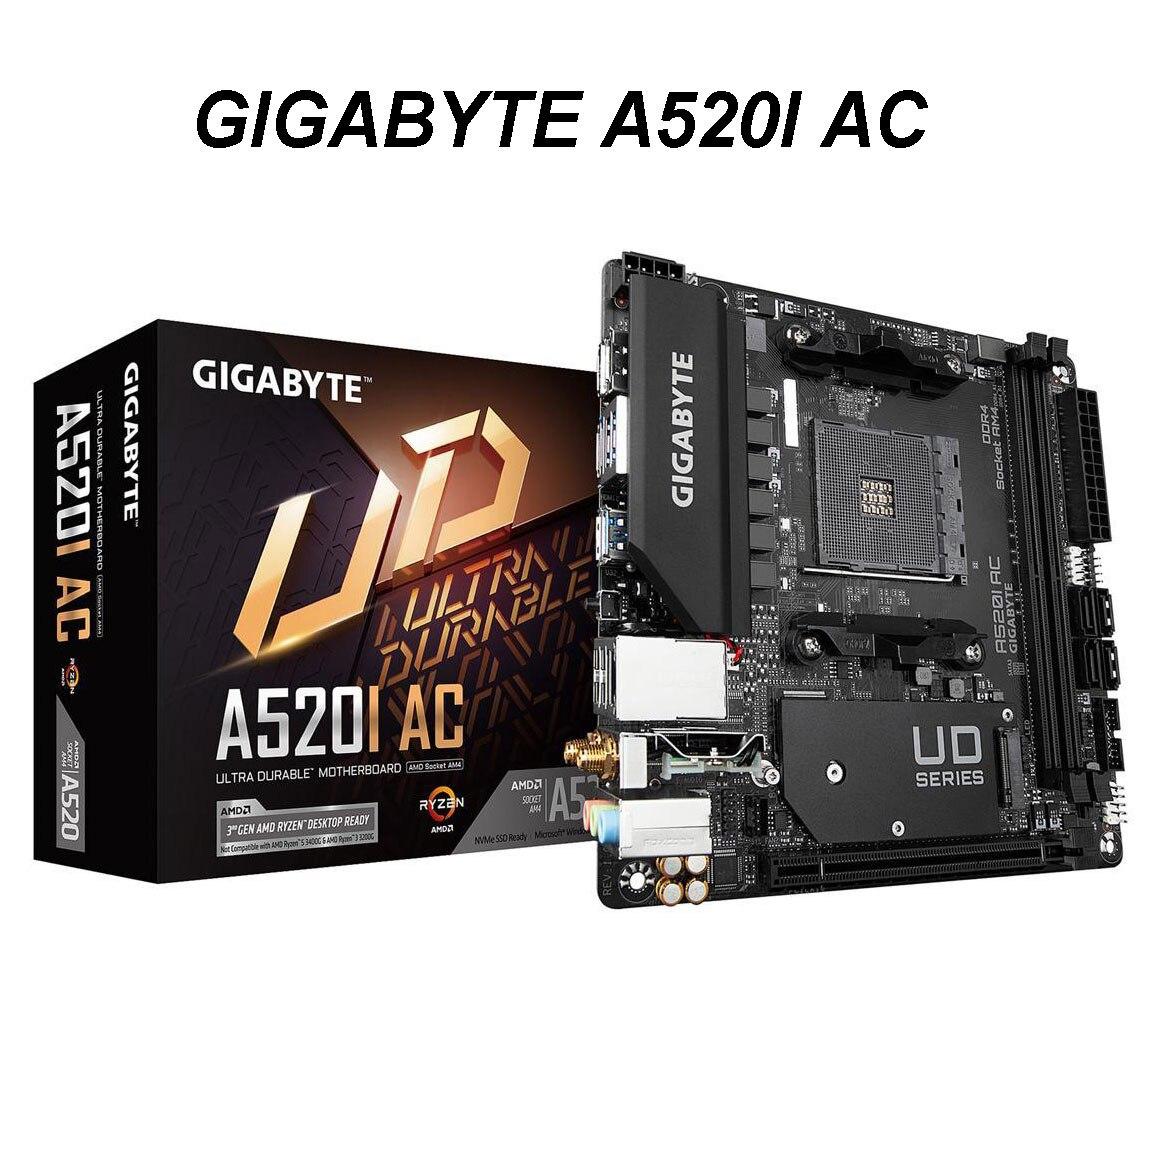 Nova gigabyte a520i ac placa-mãe mitx amd am4 soquete ddr4 64gb amd a520 1 x nvme pcie 3.0x4 m.2 slot desktop mainboard